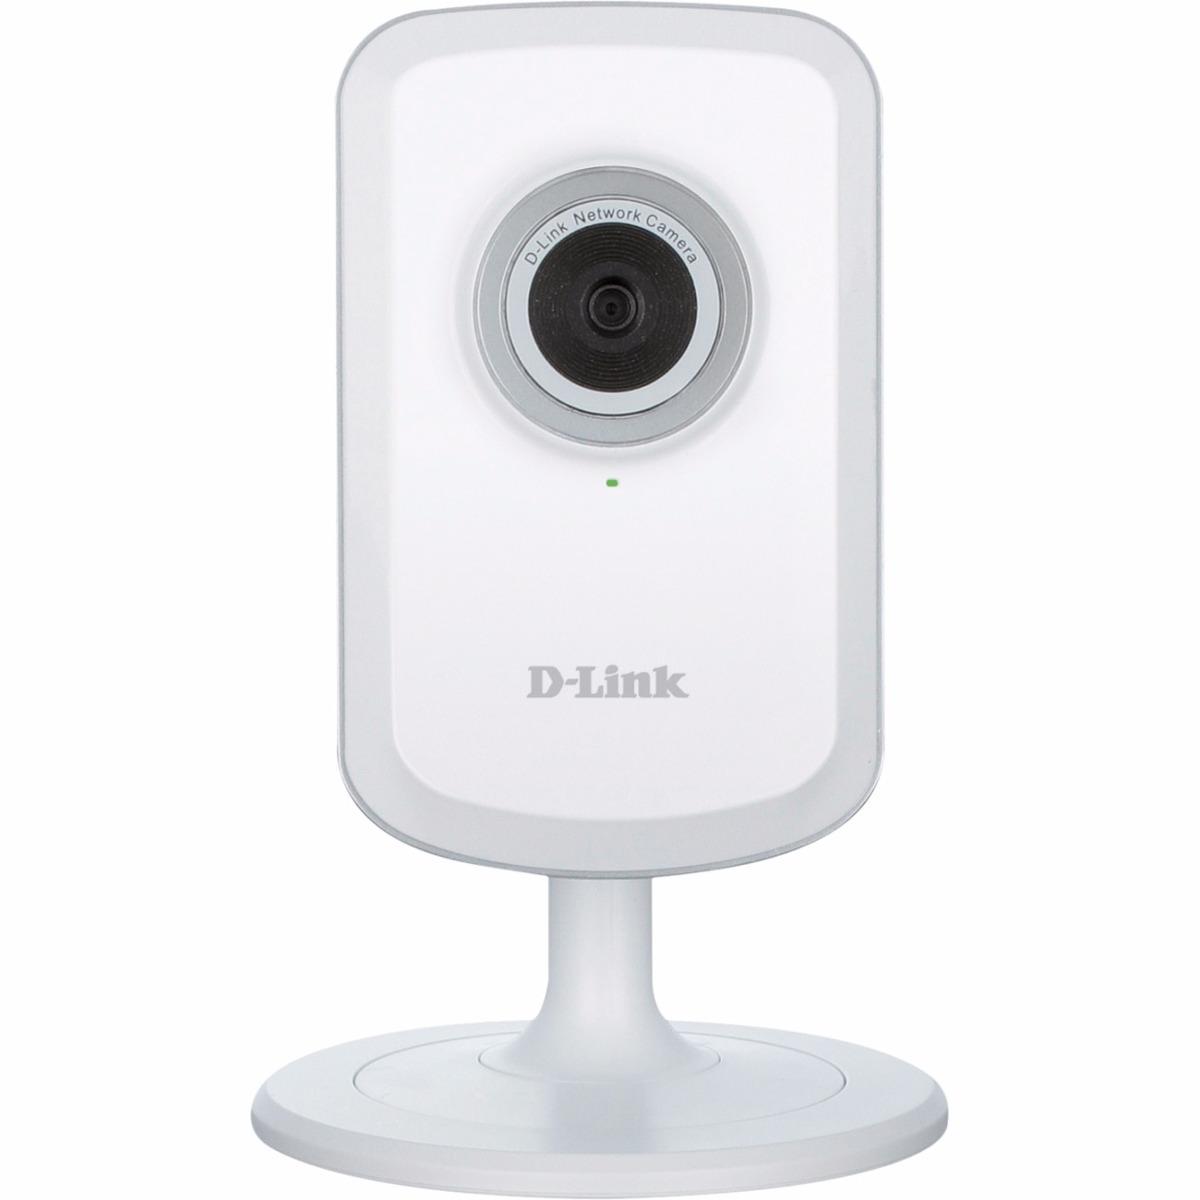 C mara ip vigilancia con repetidor de wifi d link dcs 931l - Camaras de vigilancia ip wifi ...